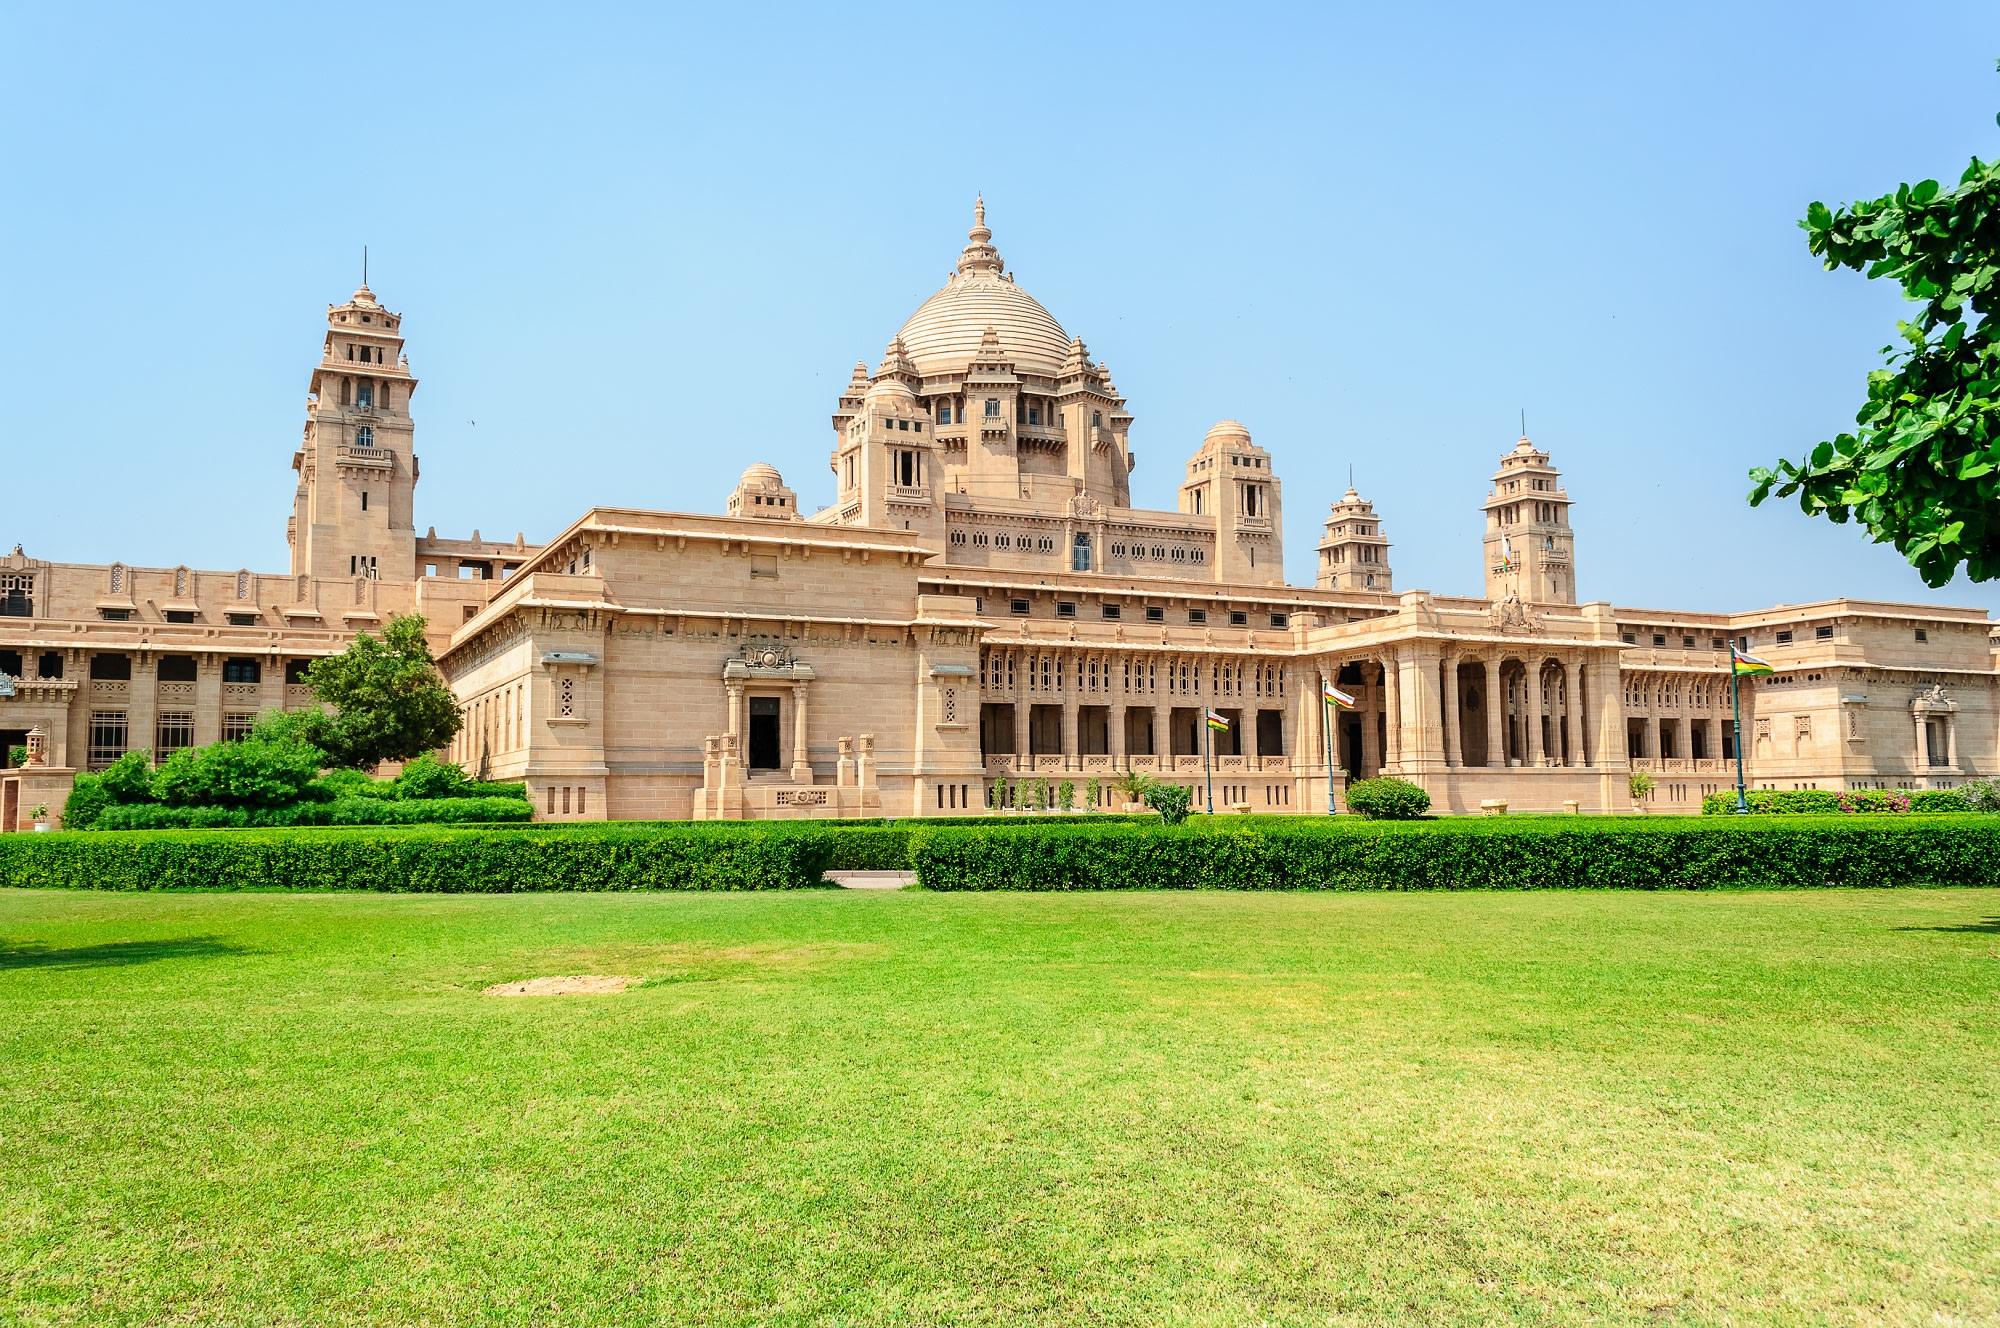 Ummaid Bhawan Palace